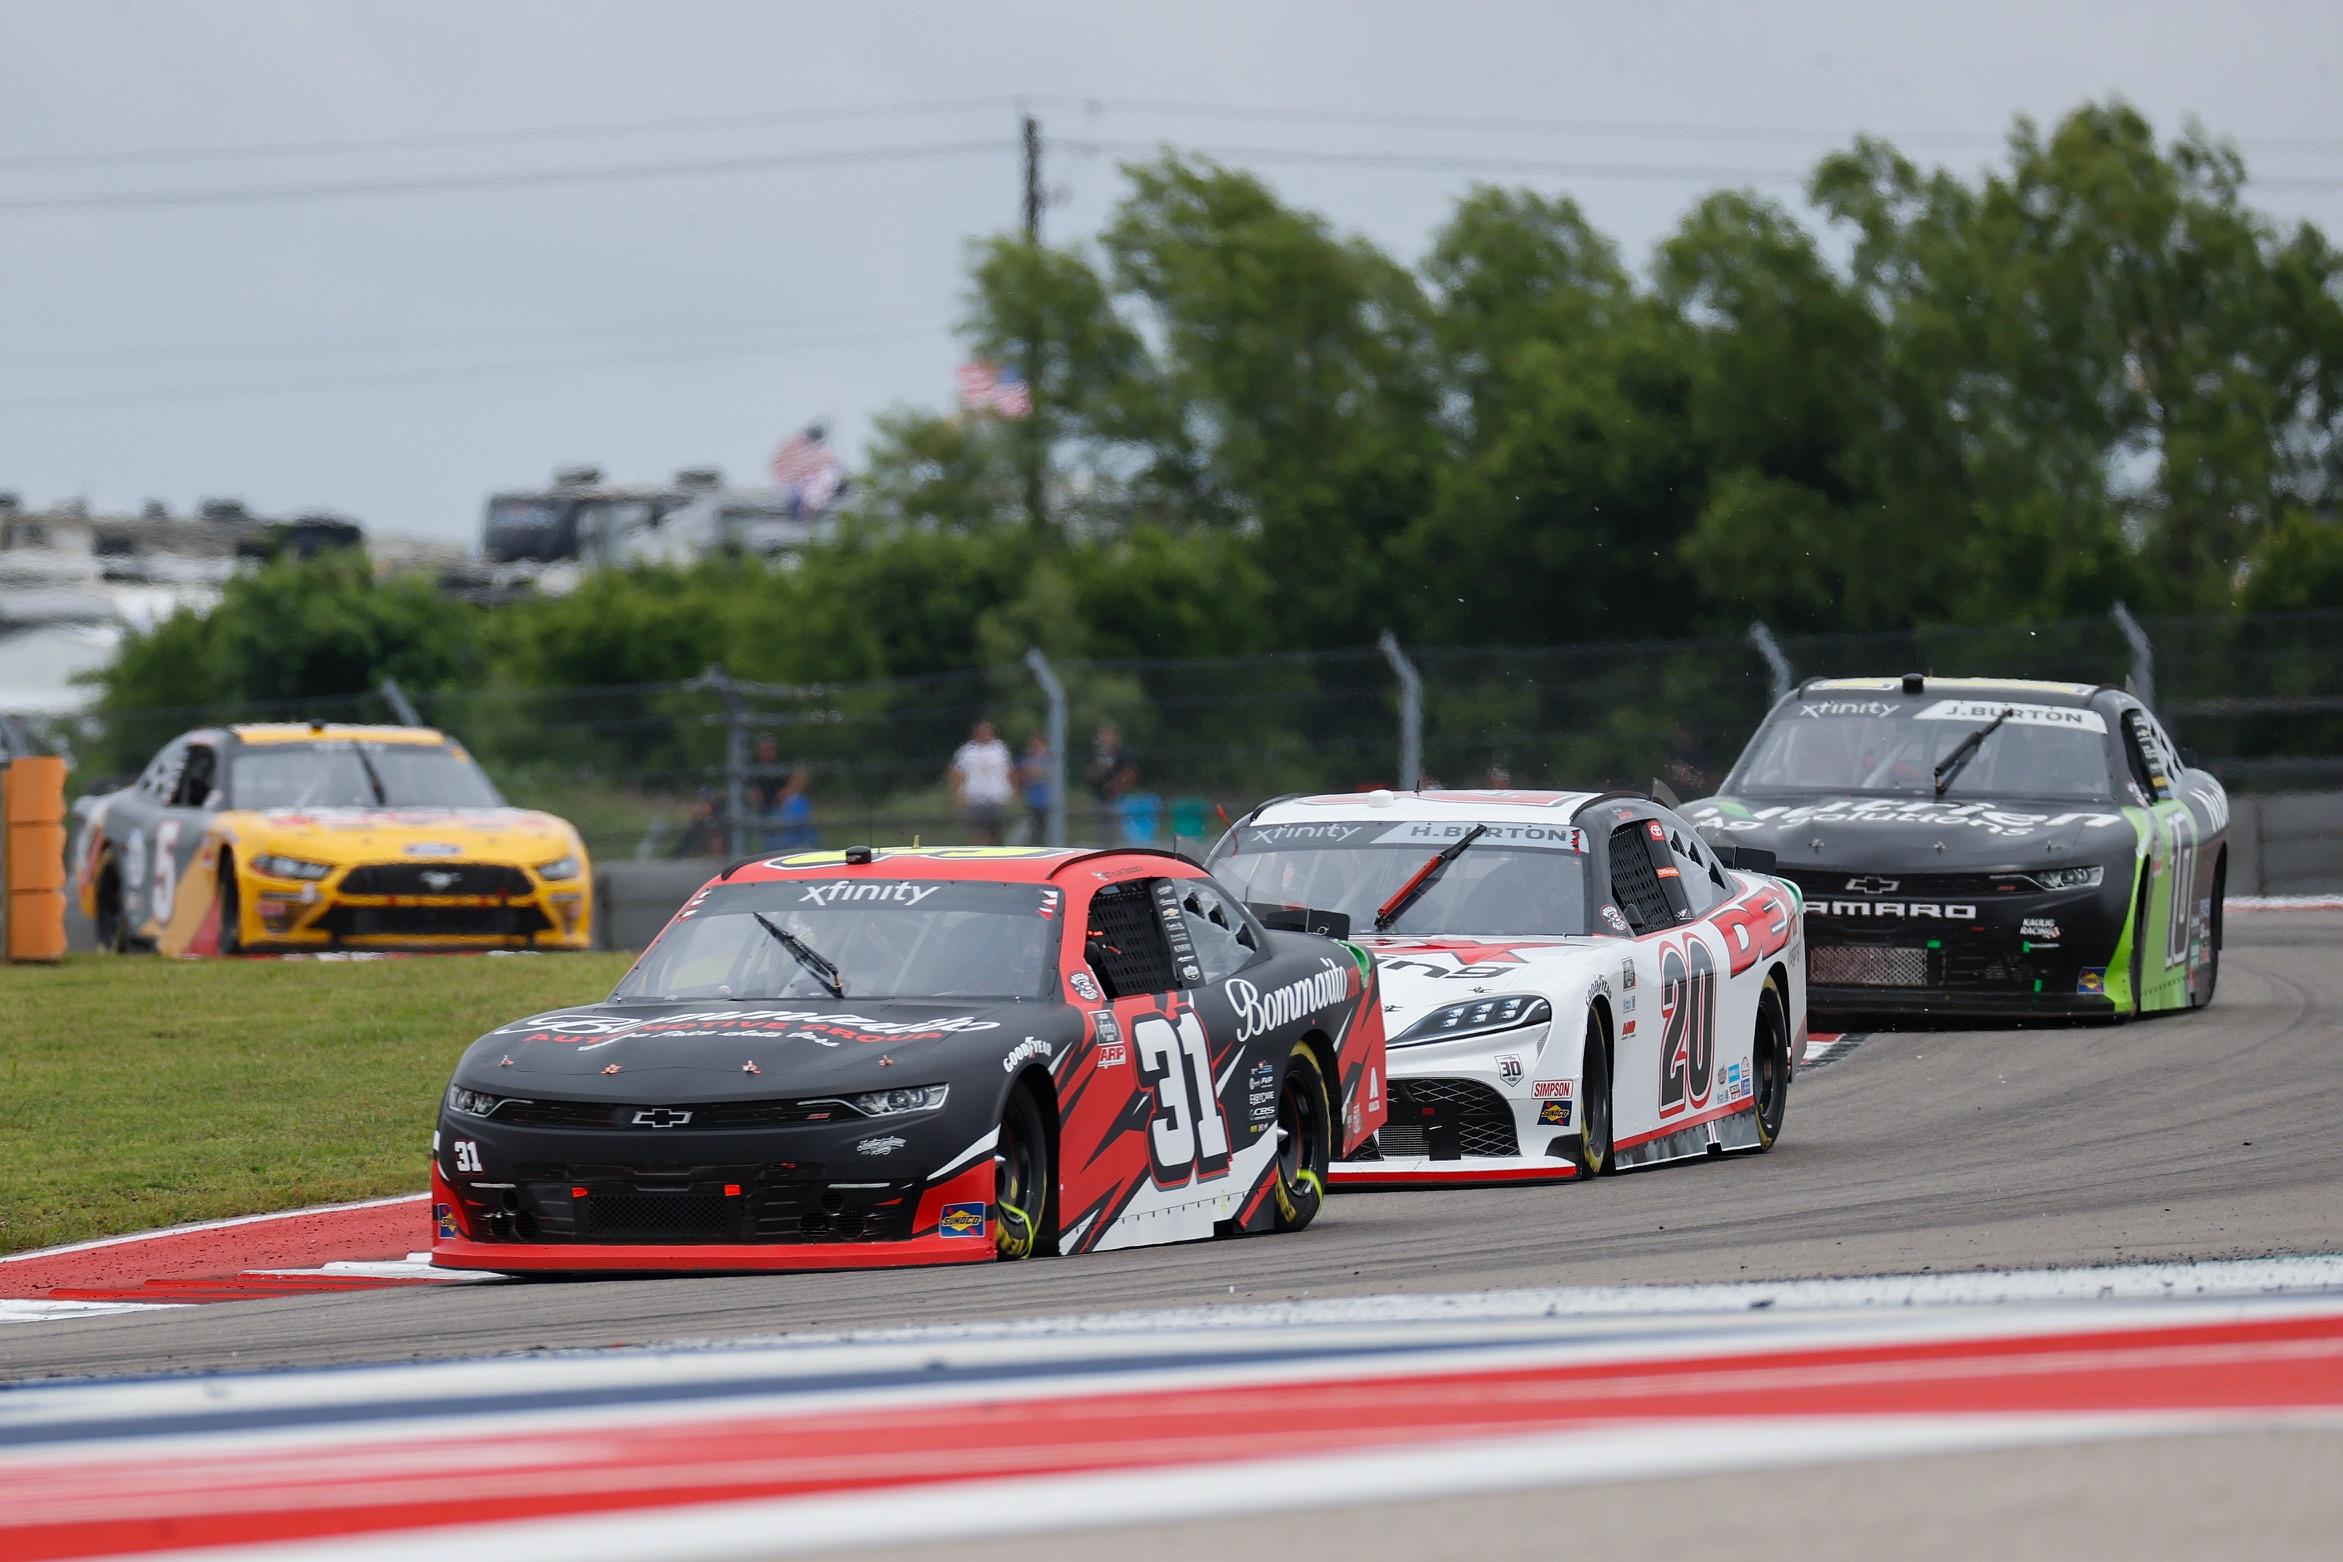 Tyler Reddick Races to Top-Ten Finish in JAR Debut at COTA